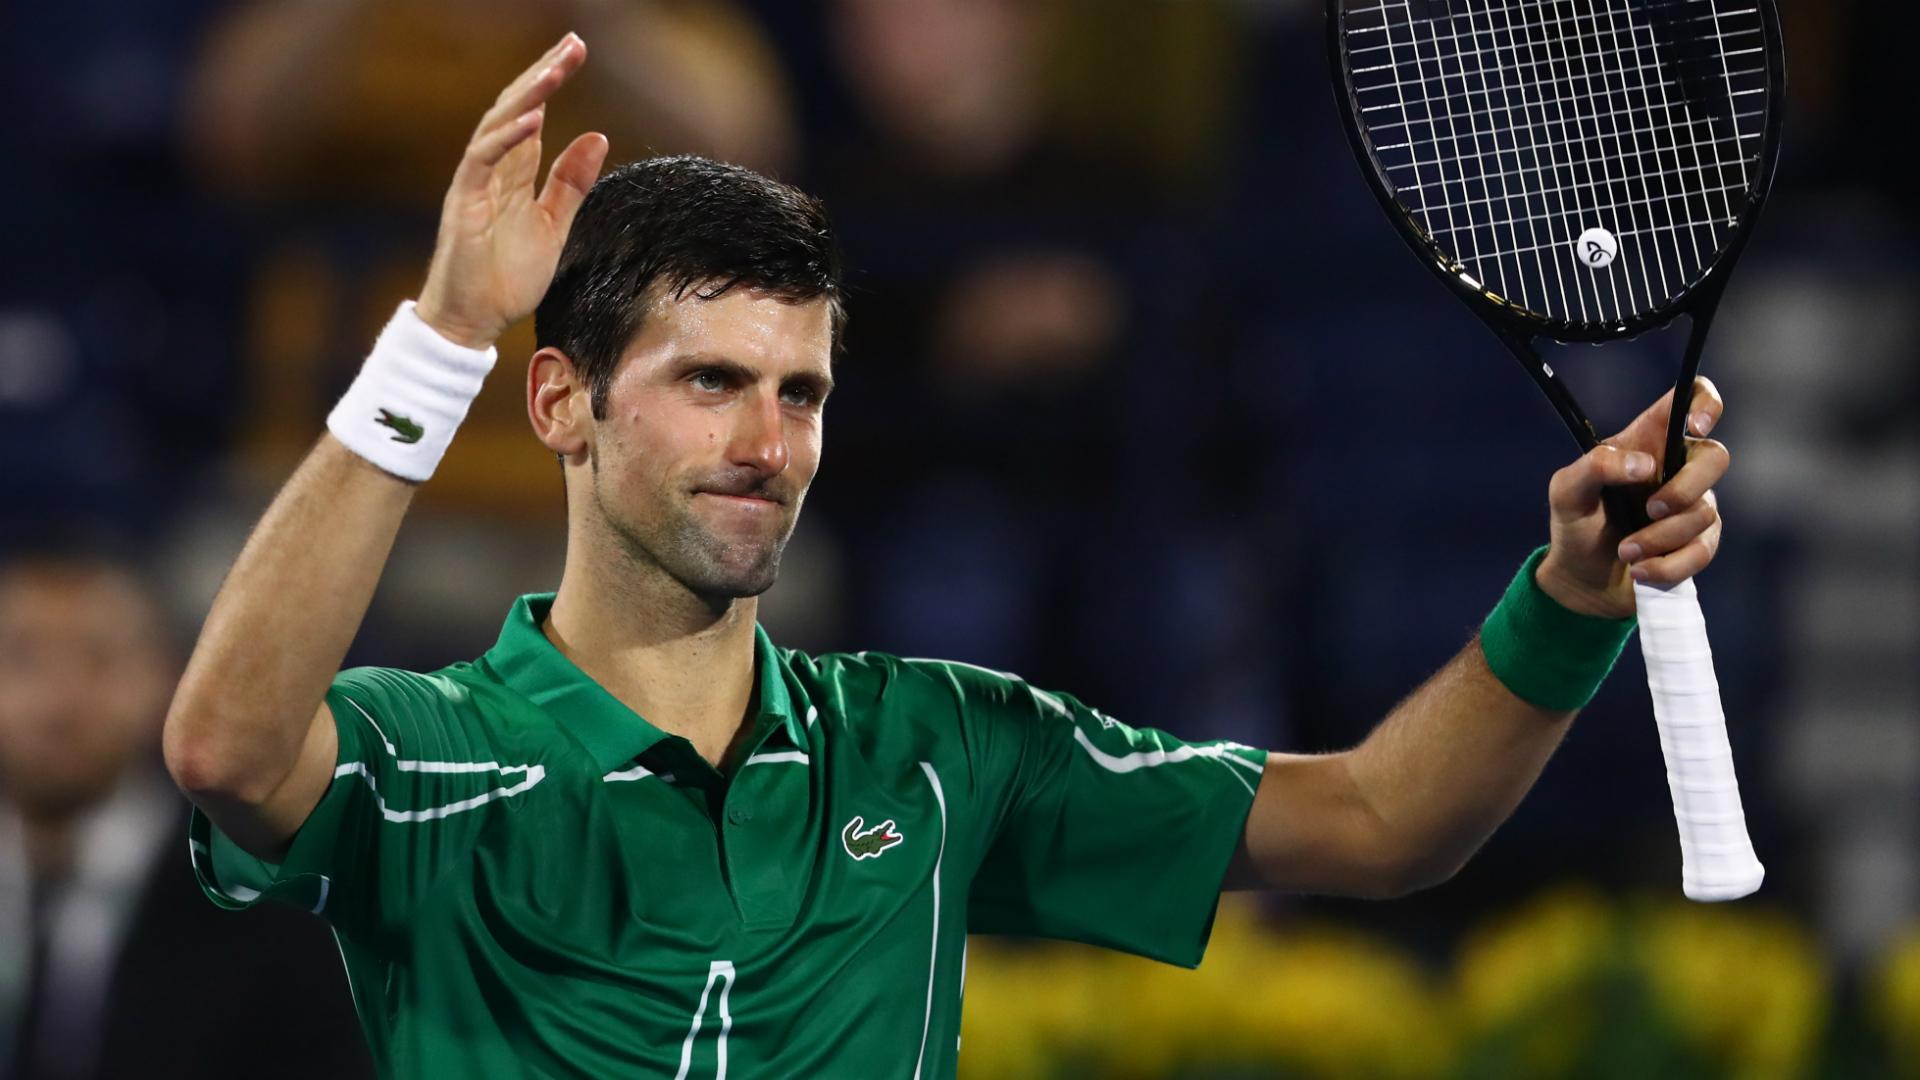 Novak Djokovic earns emphatic win in first match since Australian Open triumph